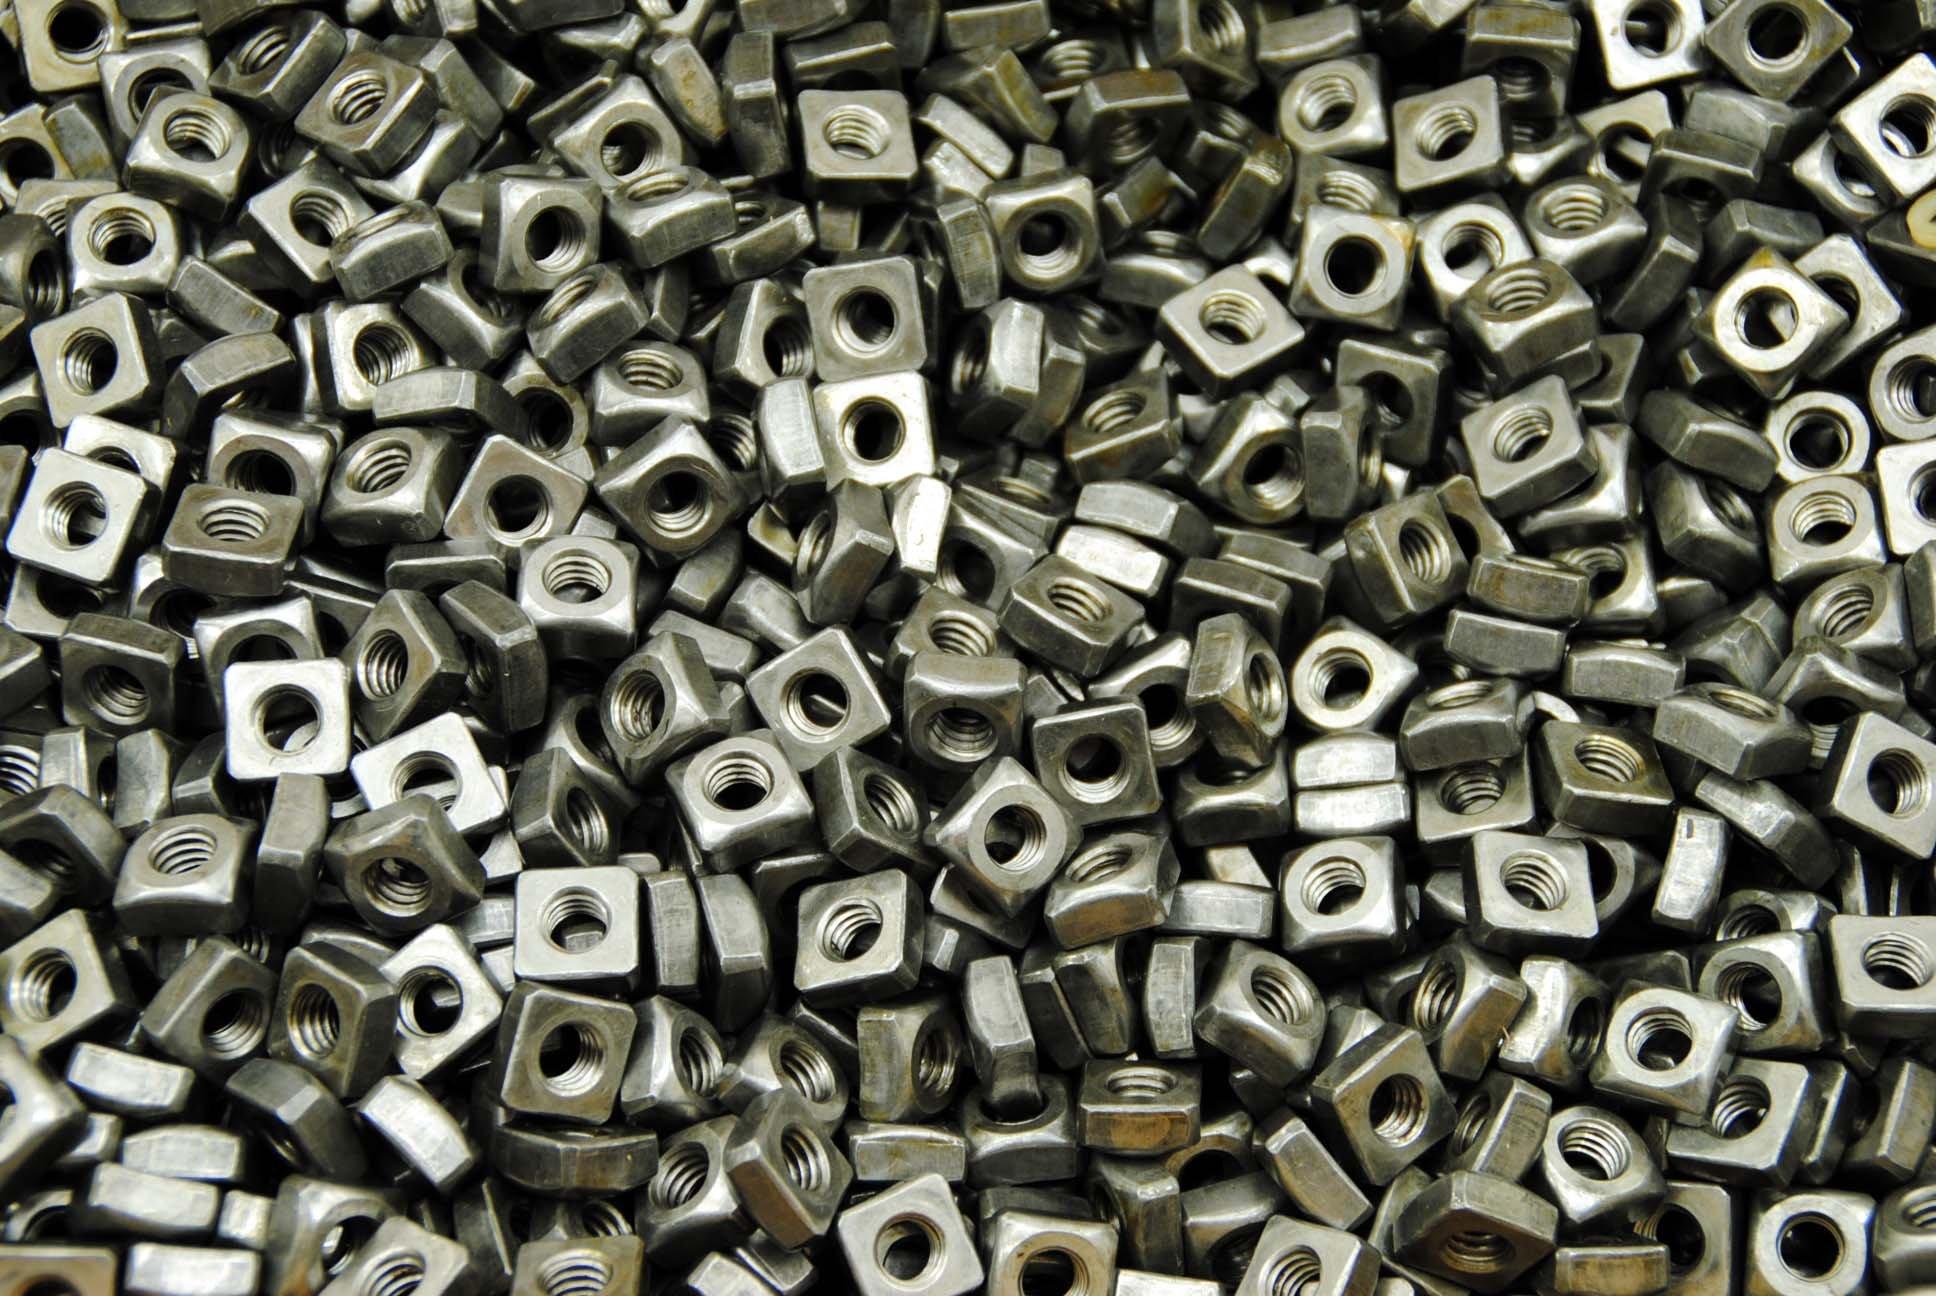 (350) Unplated 5/16-18 Square Nuts - Coarse Thread - Plain Steel